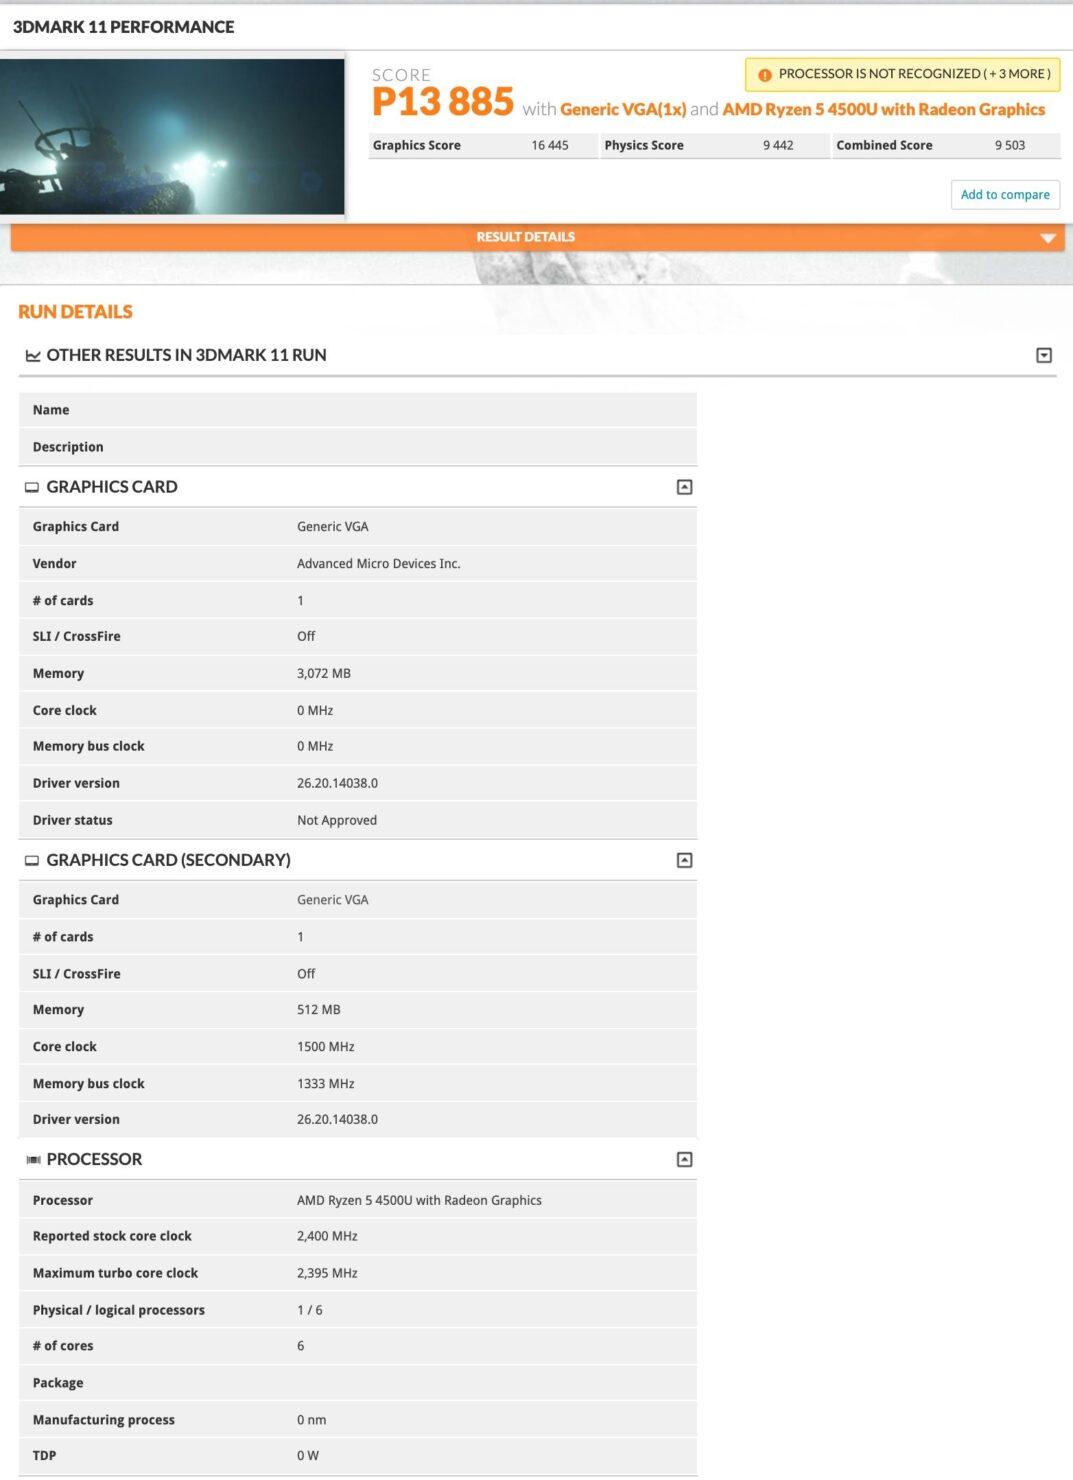 microsoft-surface-notebook-with-amd-ryzen-5-4500u-zen-2-cpu-radeon-rx-5300m-navi-gpu_1